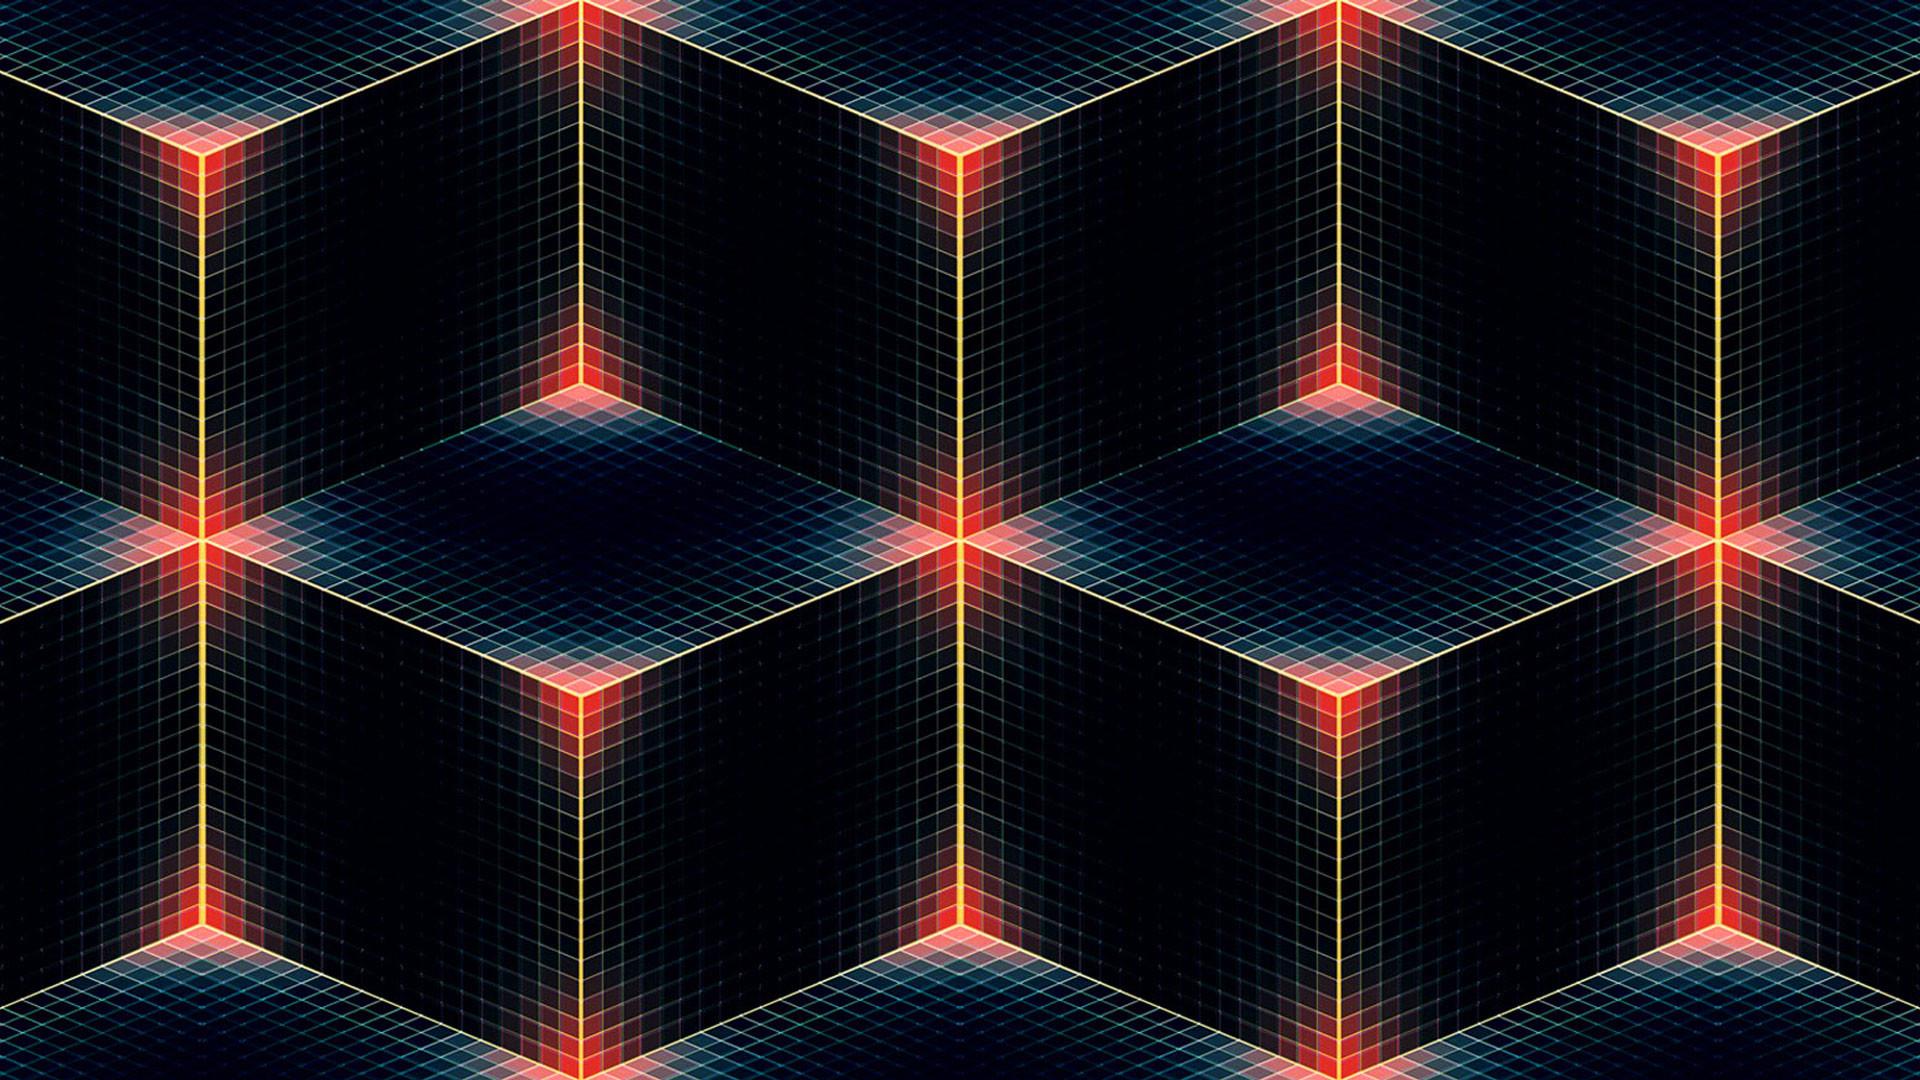 hd pics photos best 3d cubes red black digital technology hd quality desktop  background wallpaper